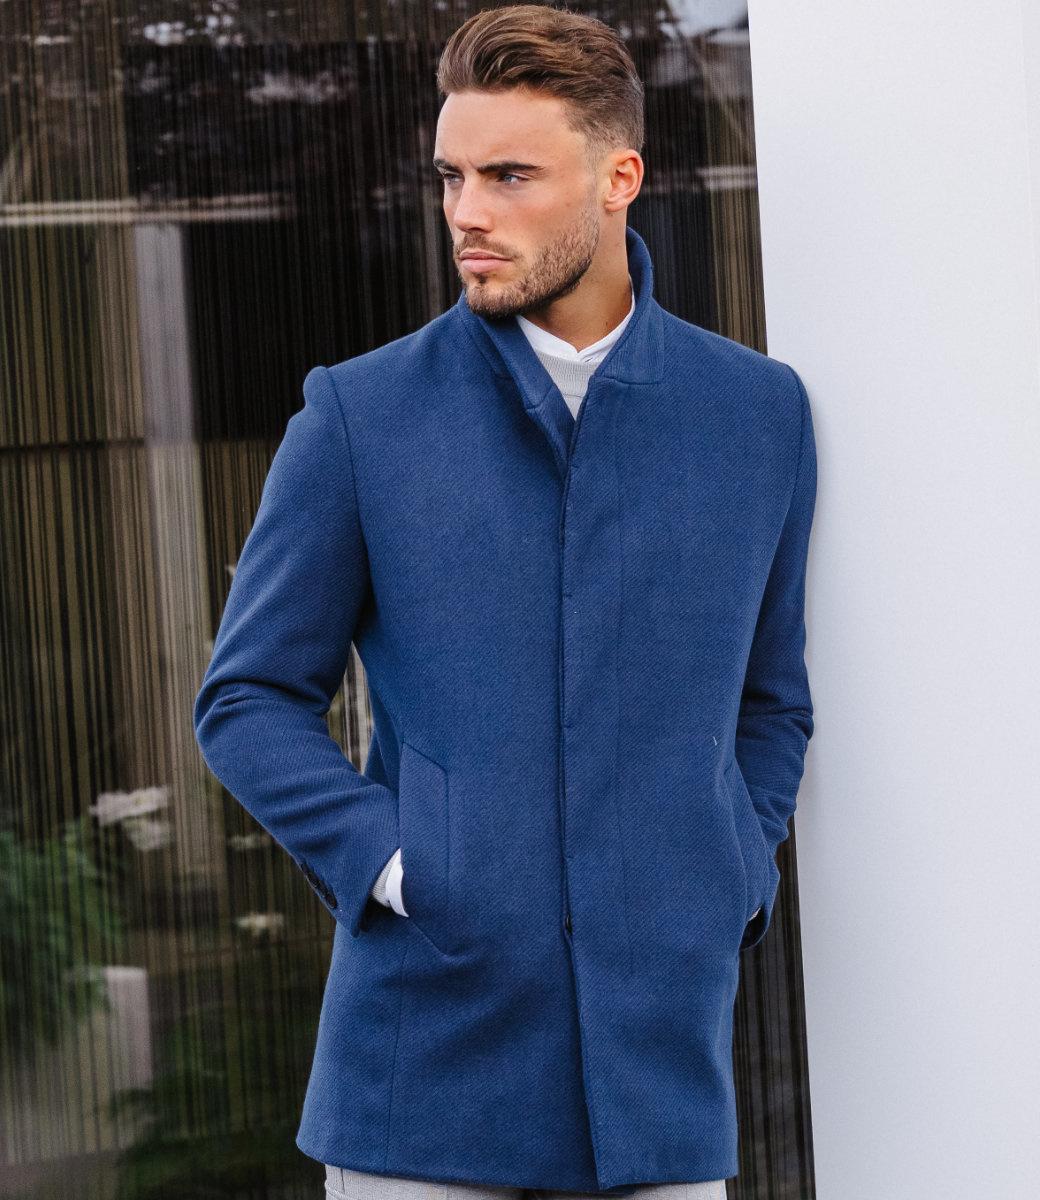 Zumo Slim Fit Coats RICHMOND-IT-CAPRI Blue